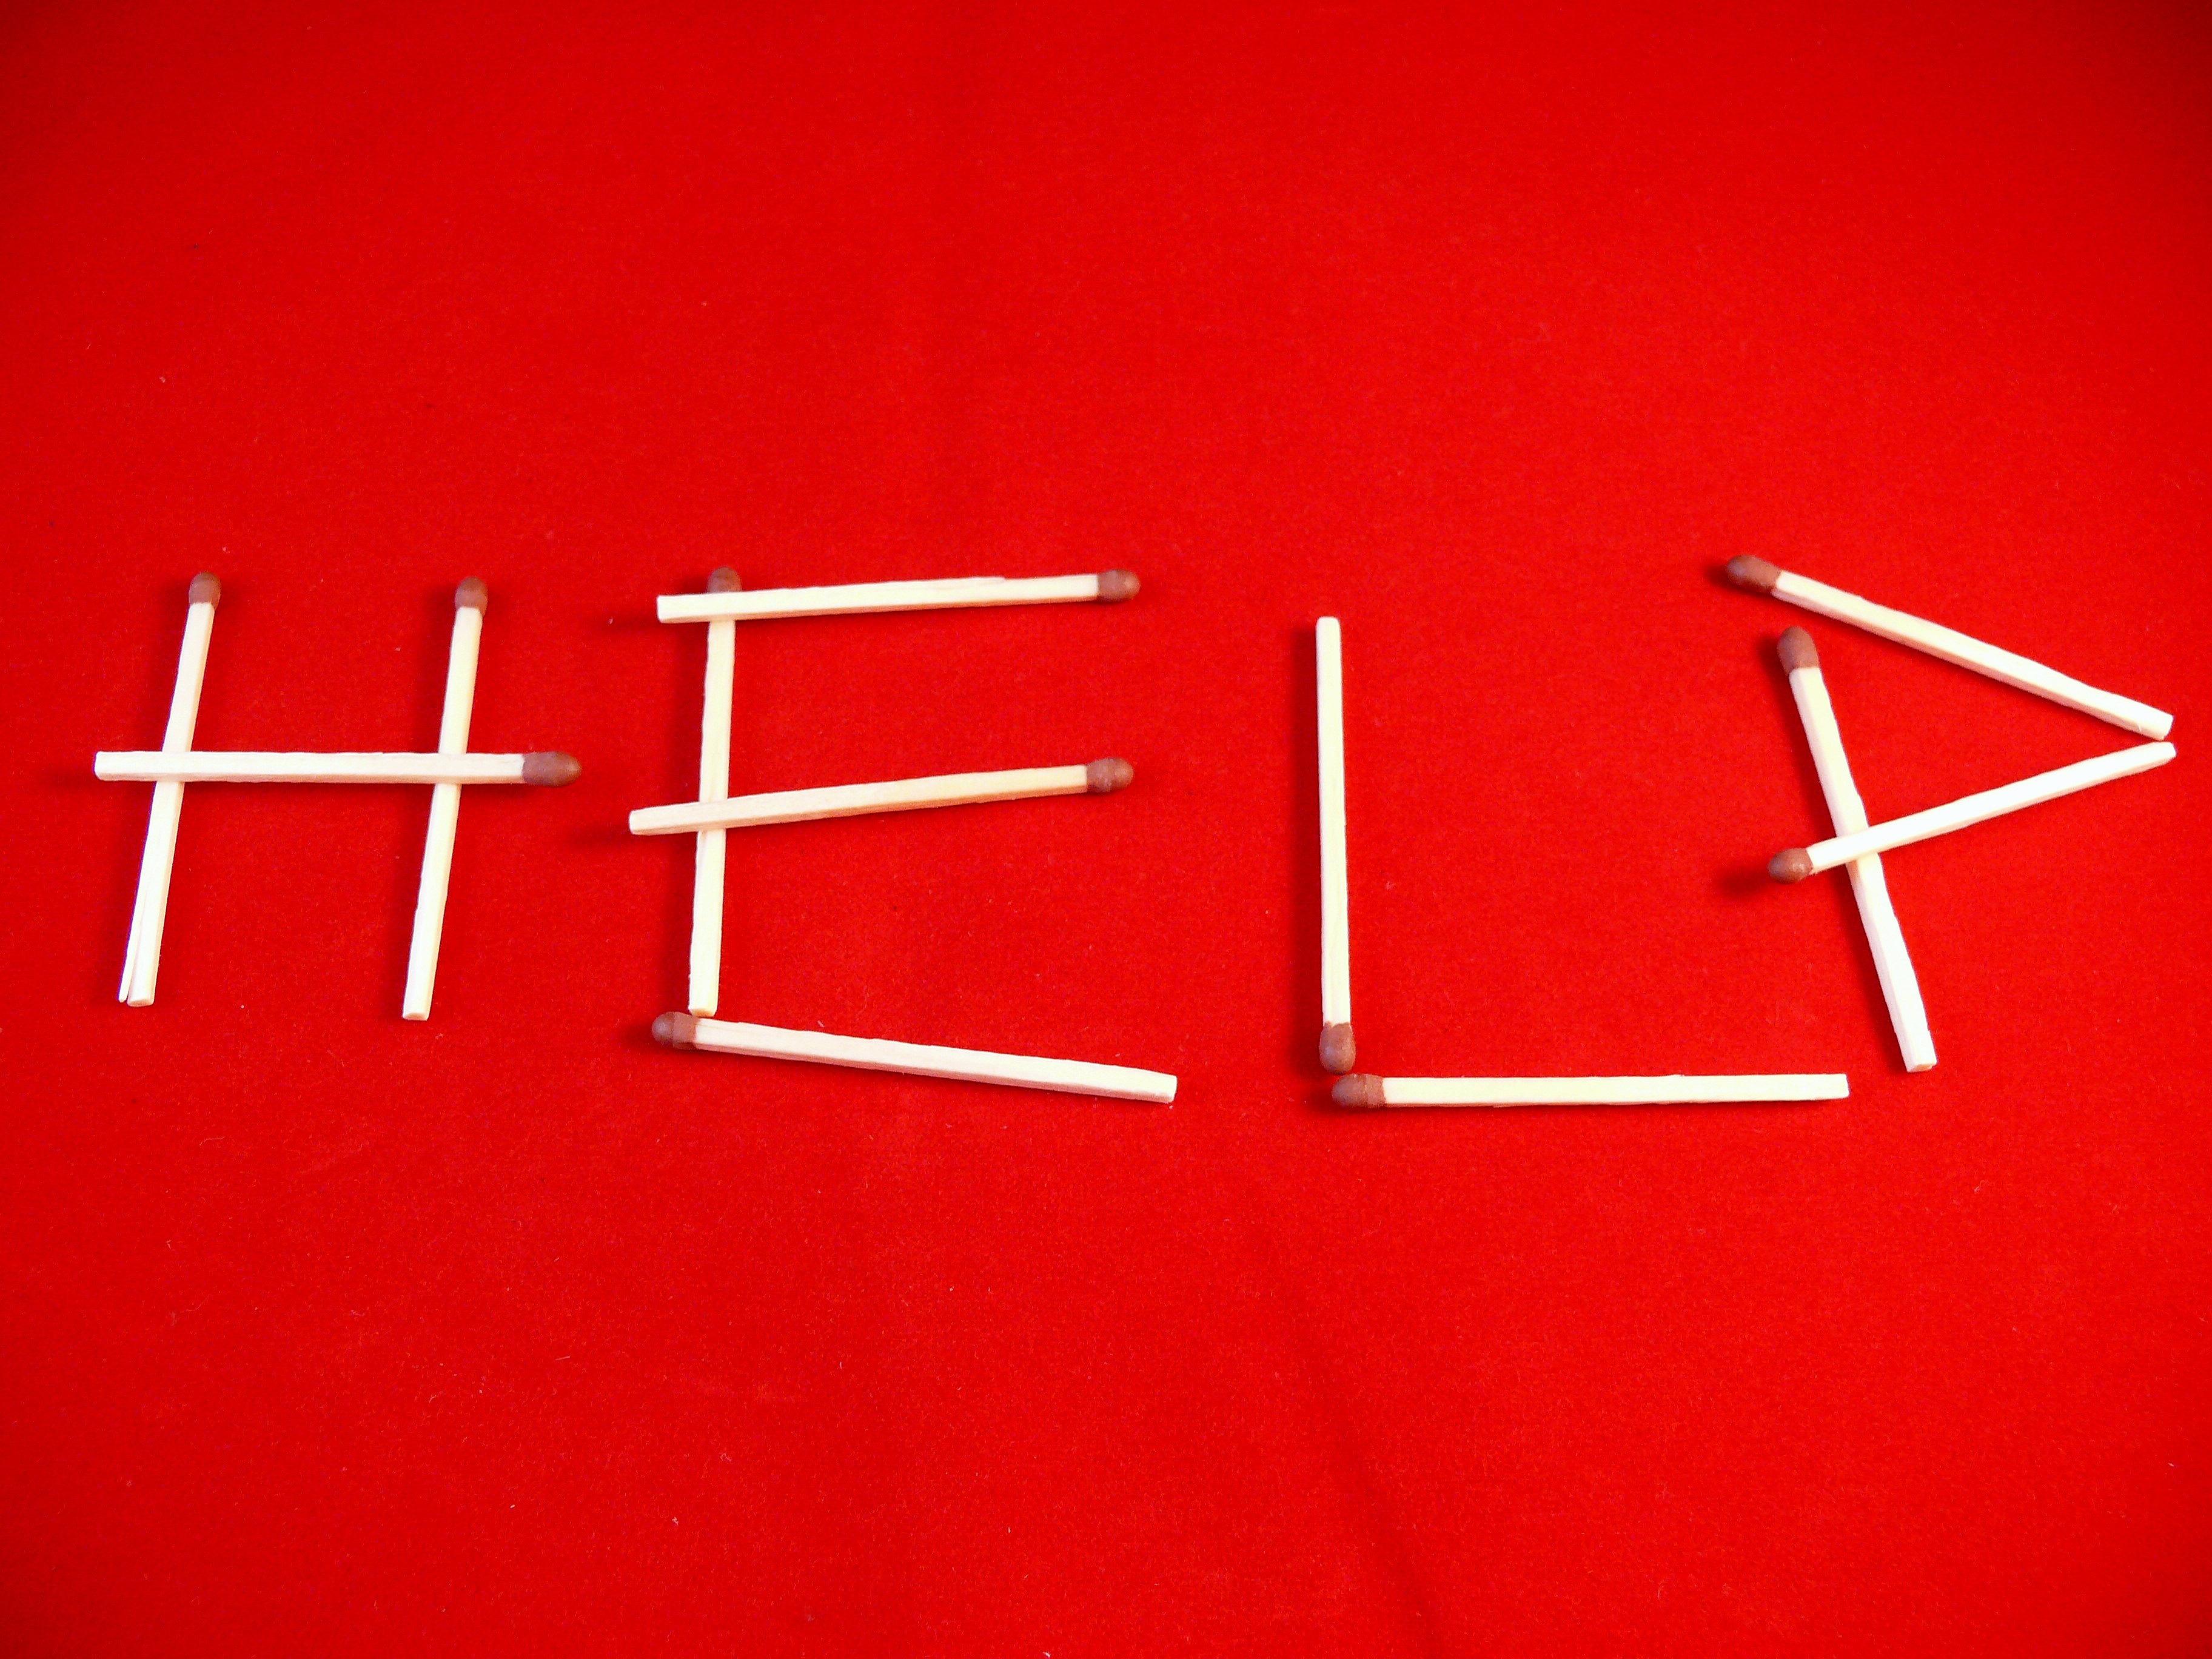 greetly-digital-receptionist-help.jpeg